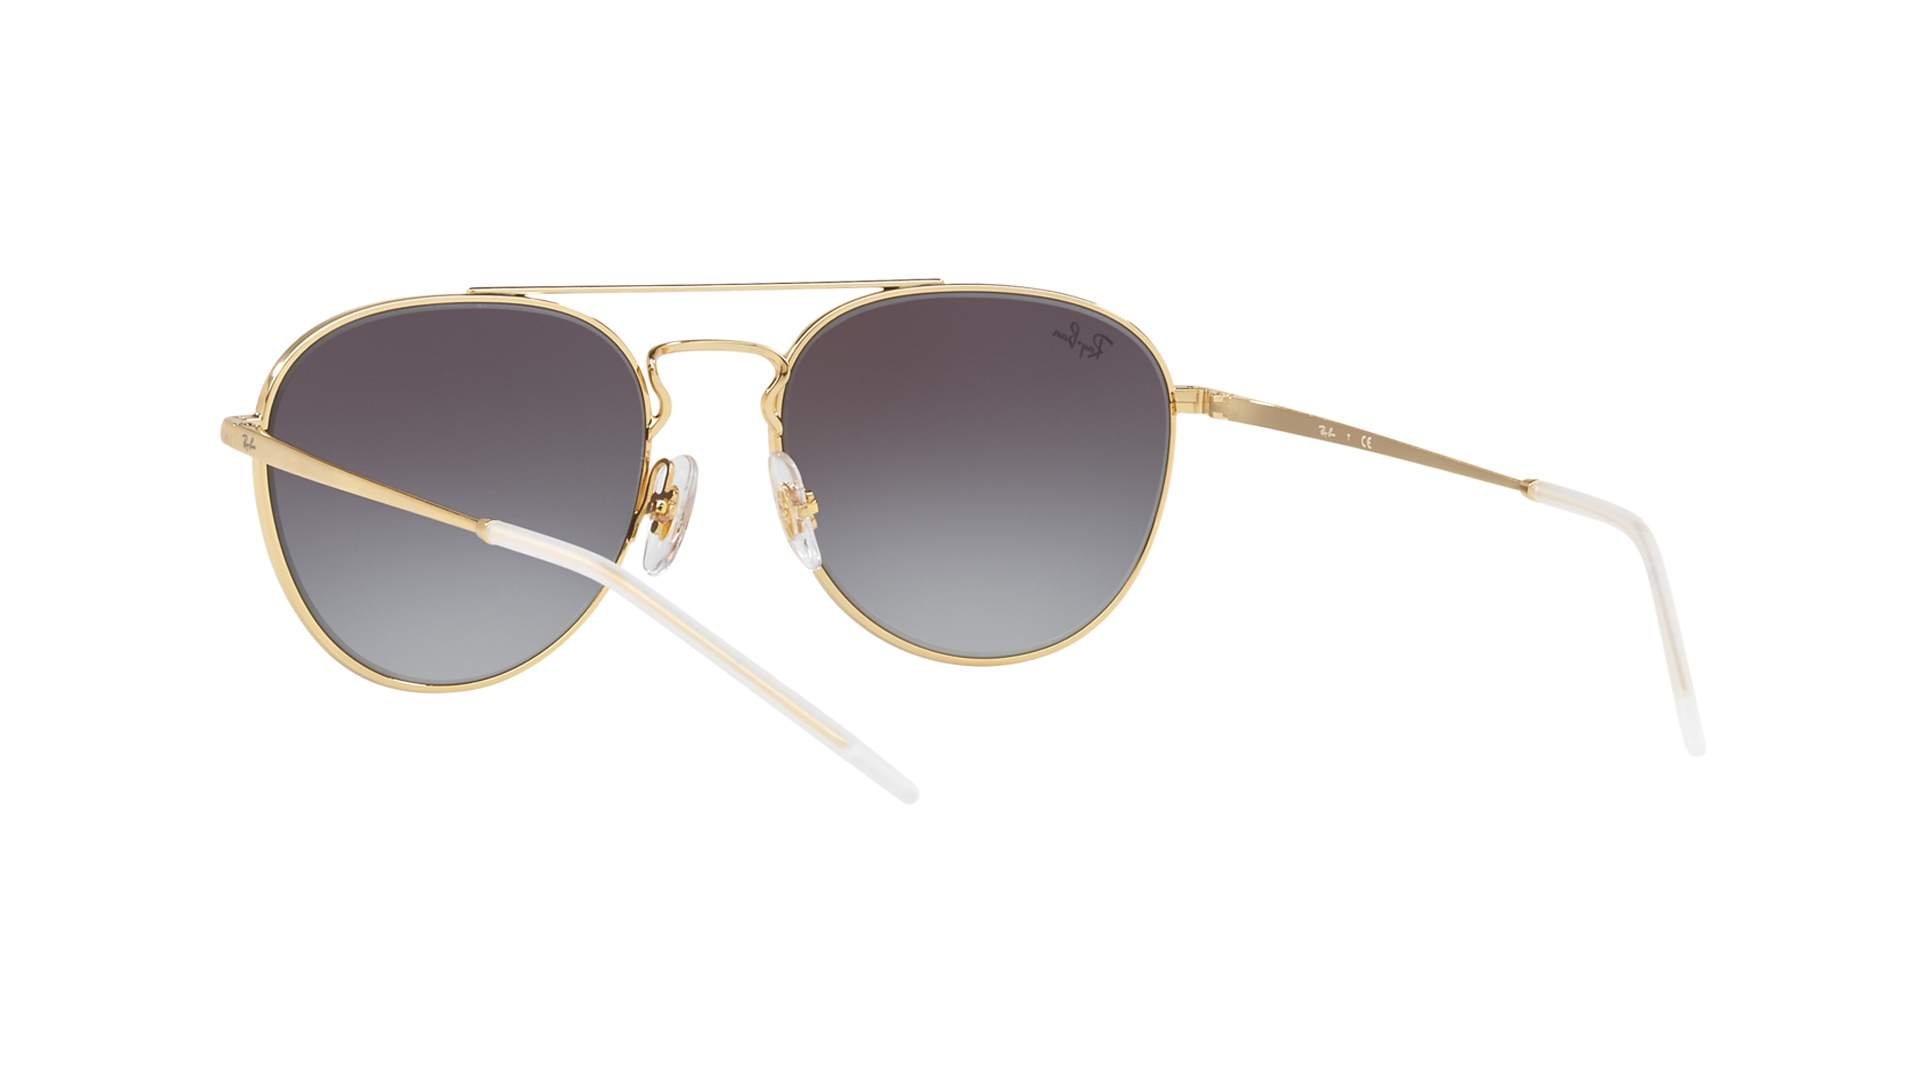 3db41228ac Sunglasses Ray-Ban RB3589 9054 8G 55-18 Black Medium Gradient